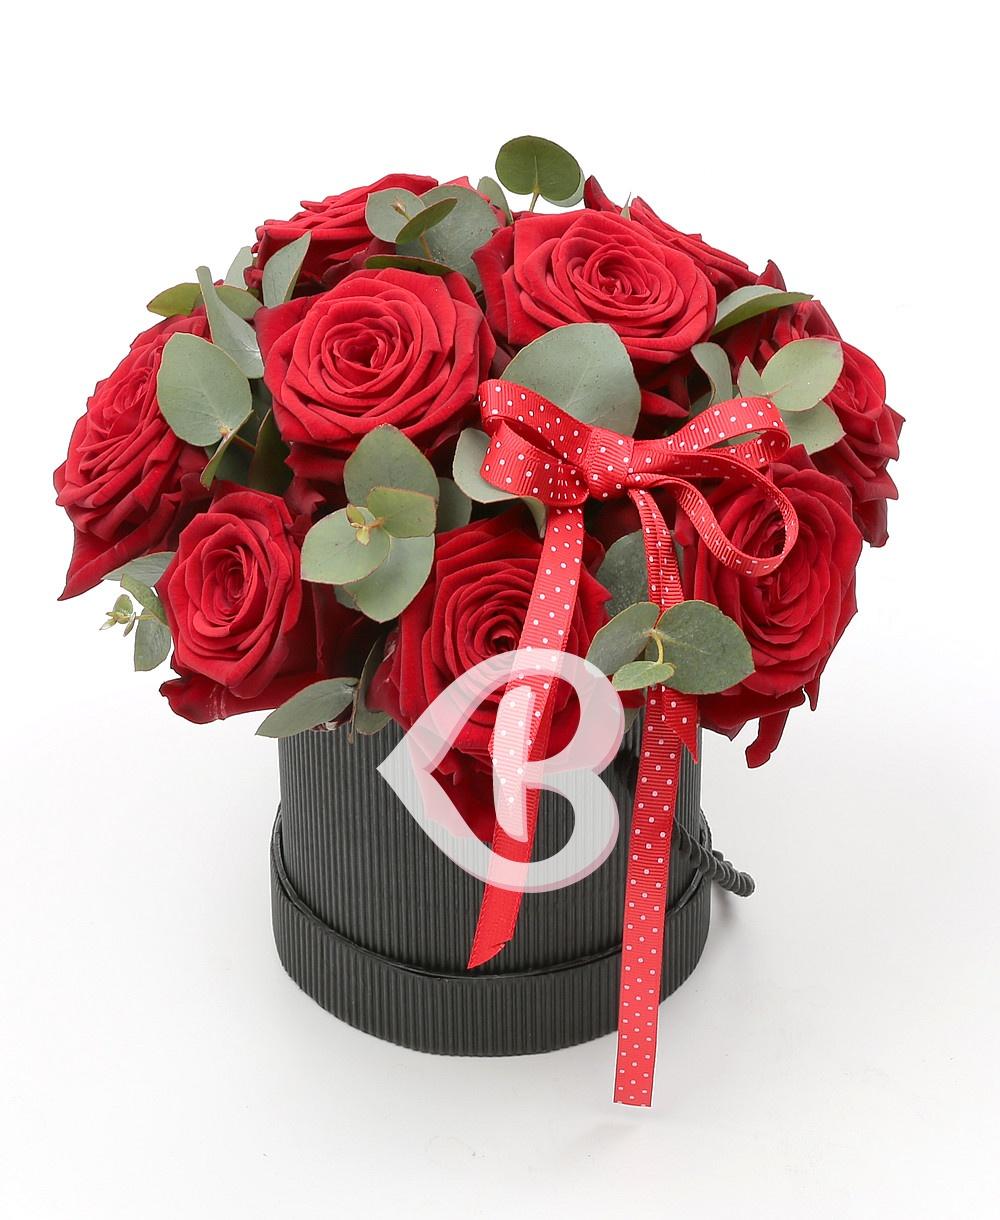 Imaginea produsului Cutie Cu 11 Trandafiri Roșii